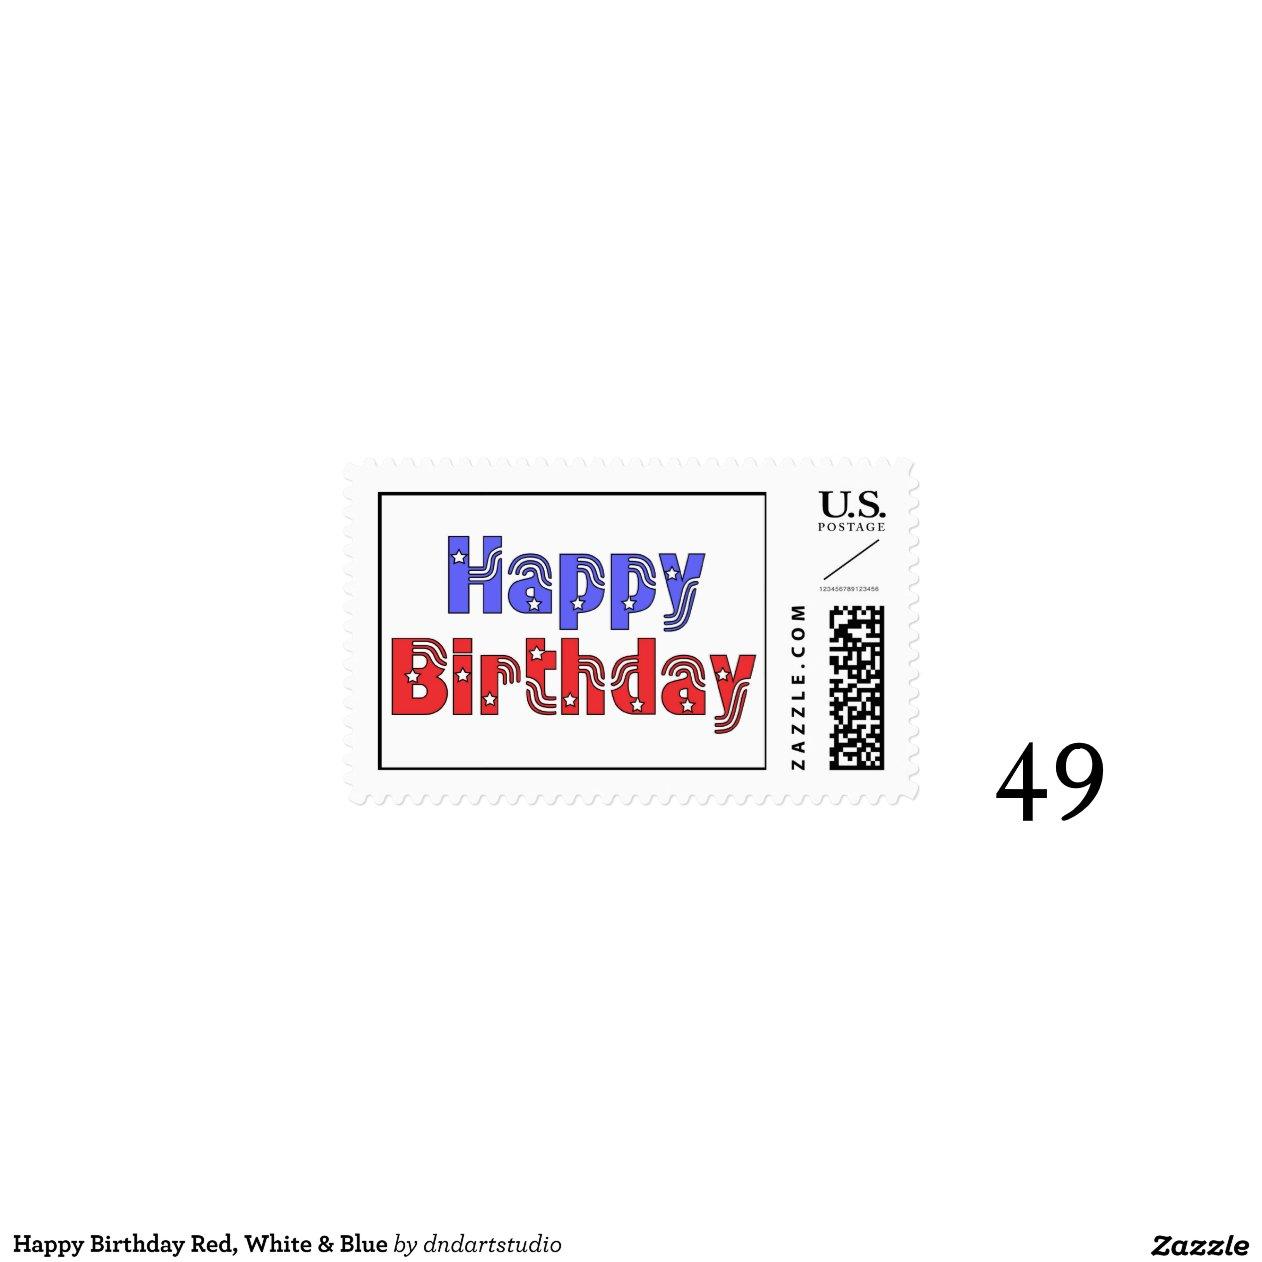 Happy Birthday Red, White & Blue Stamps | Zazzle